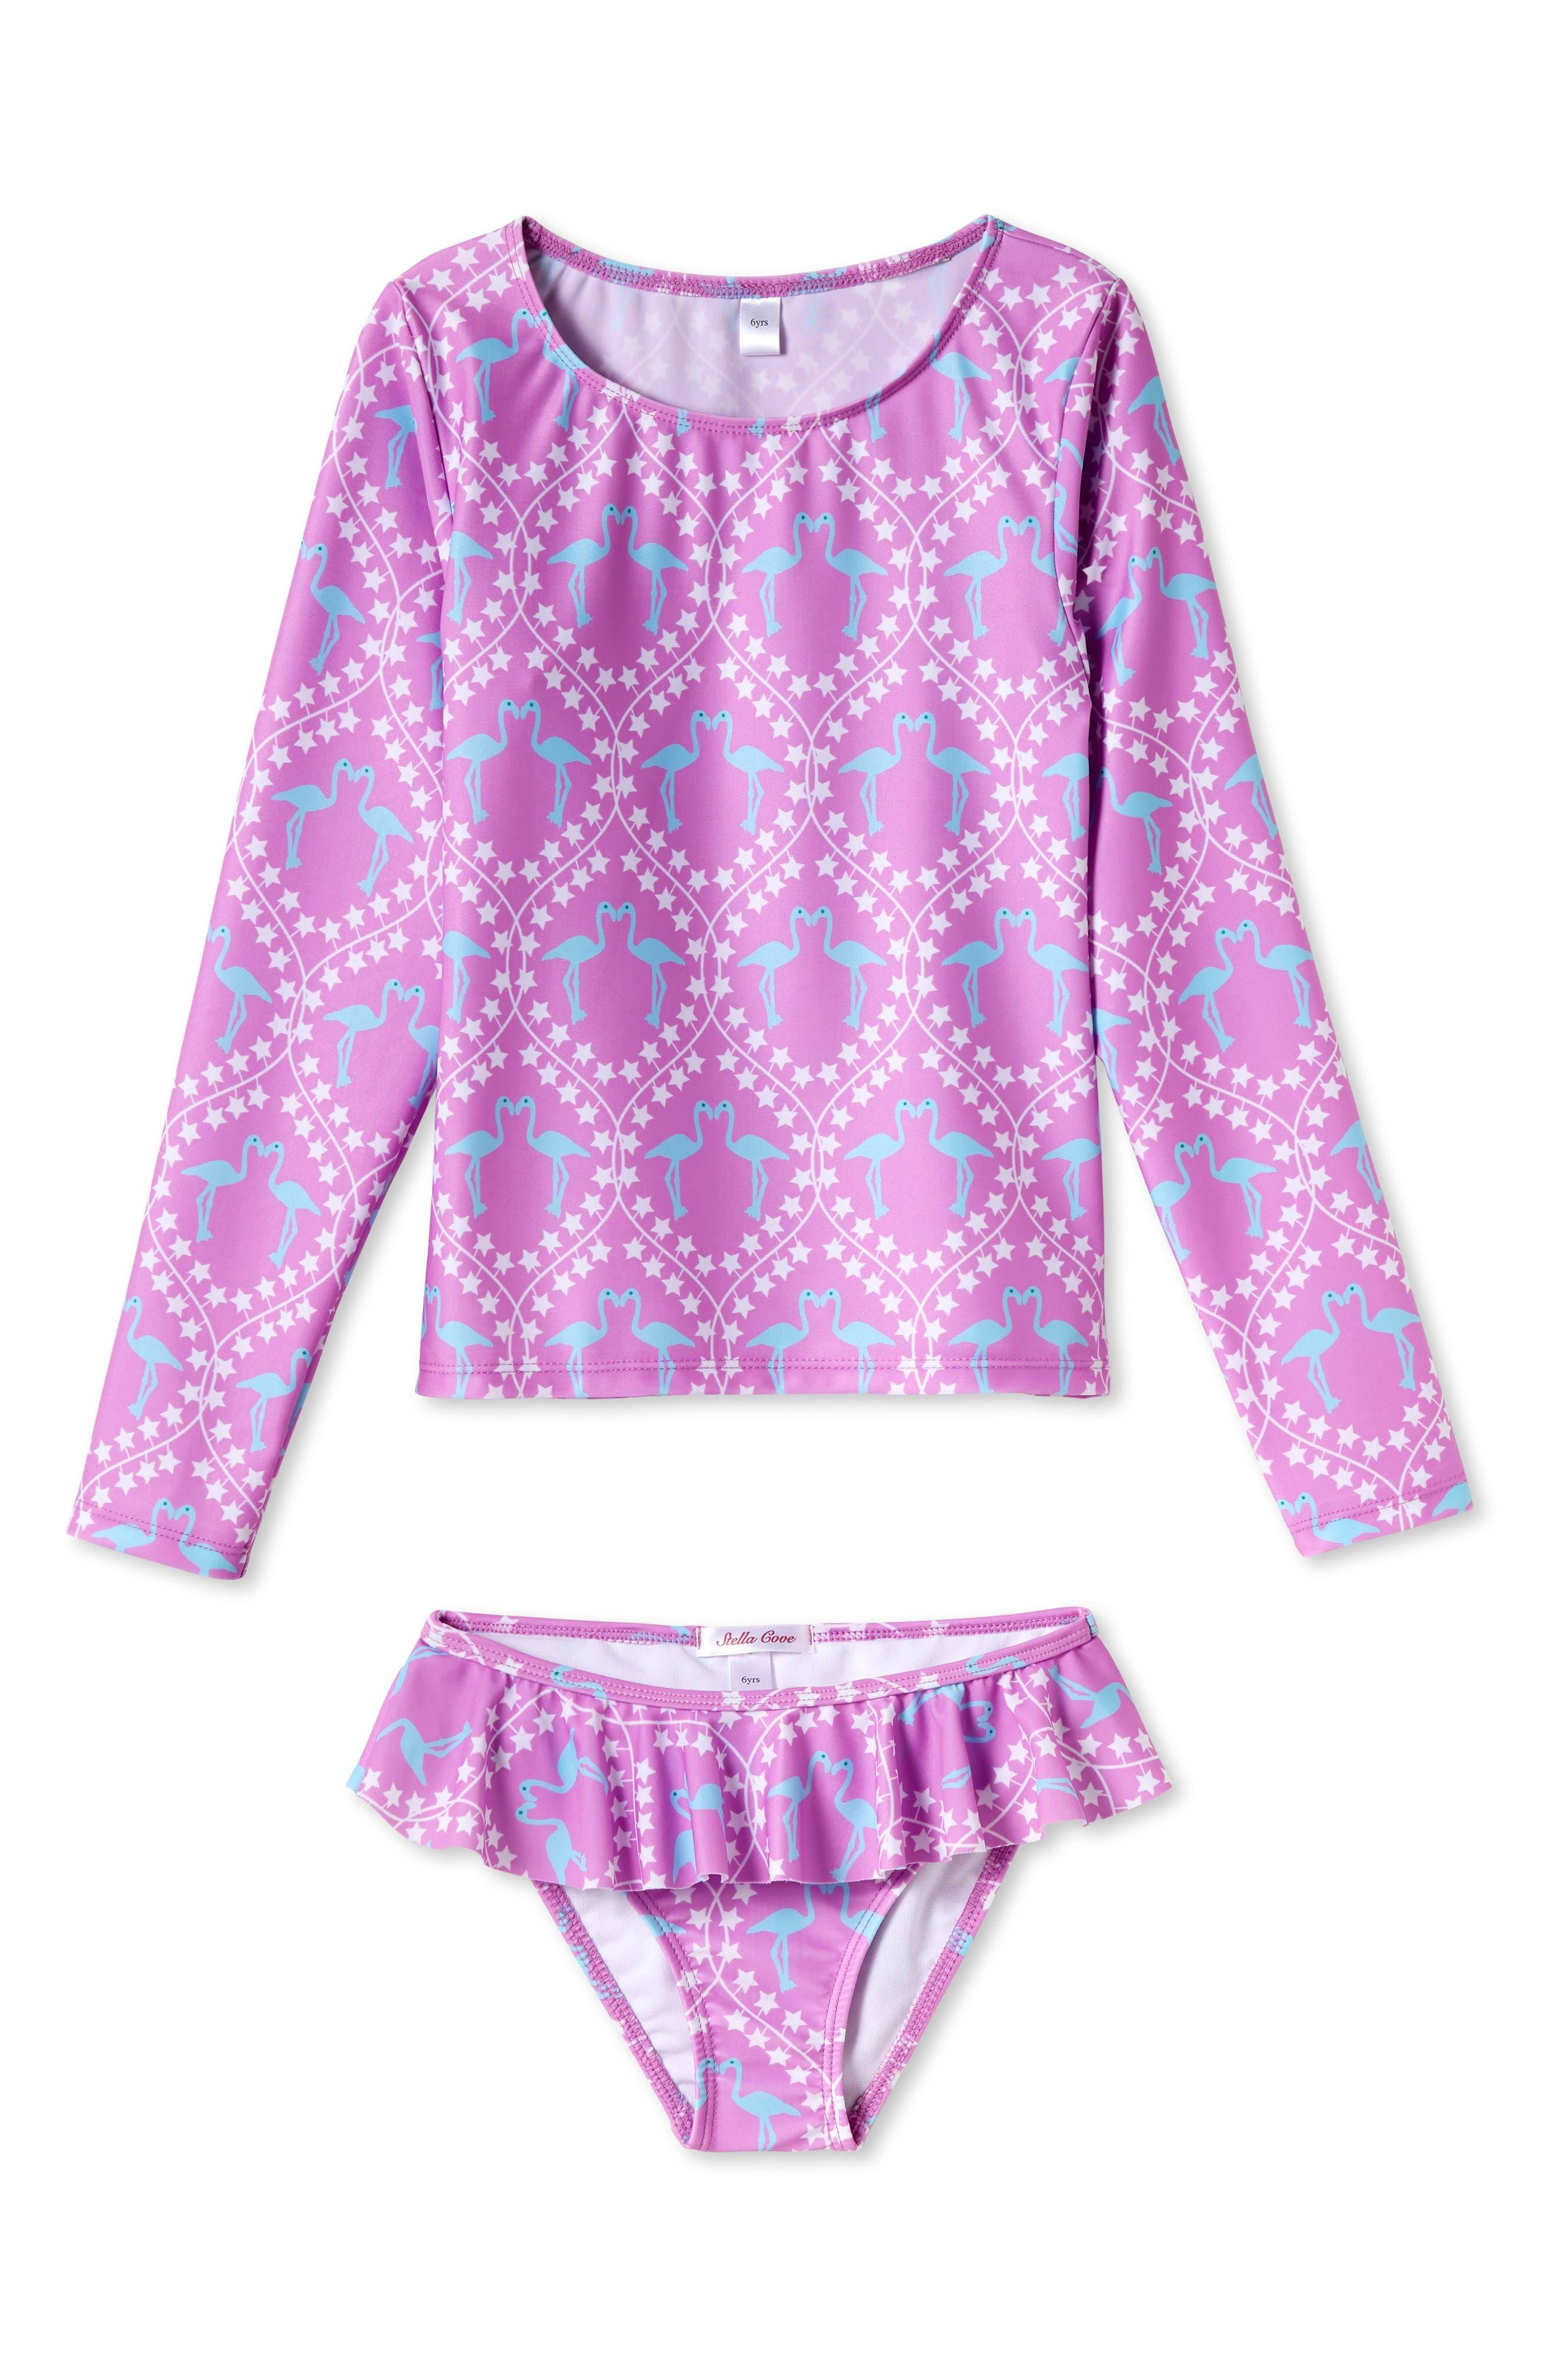 Flamingo Print Two-Piece Rashguard Swimsuit,                         Main,                         color, PINK